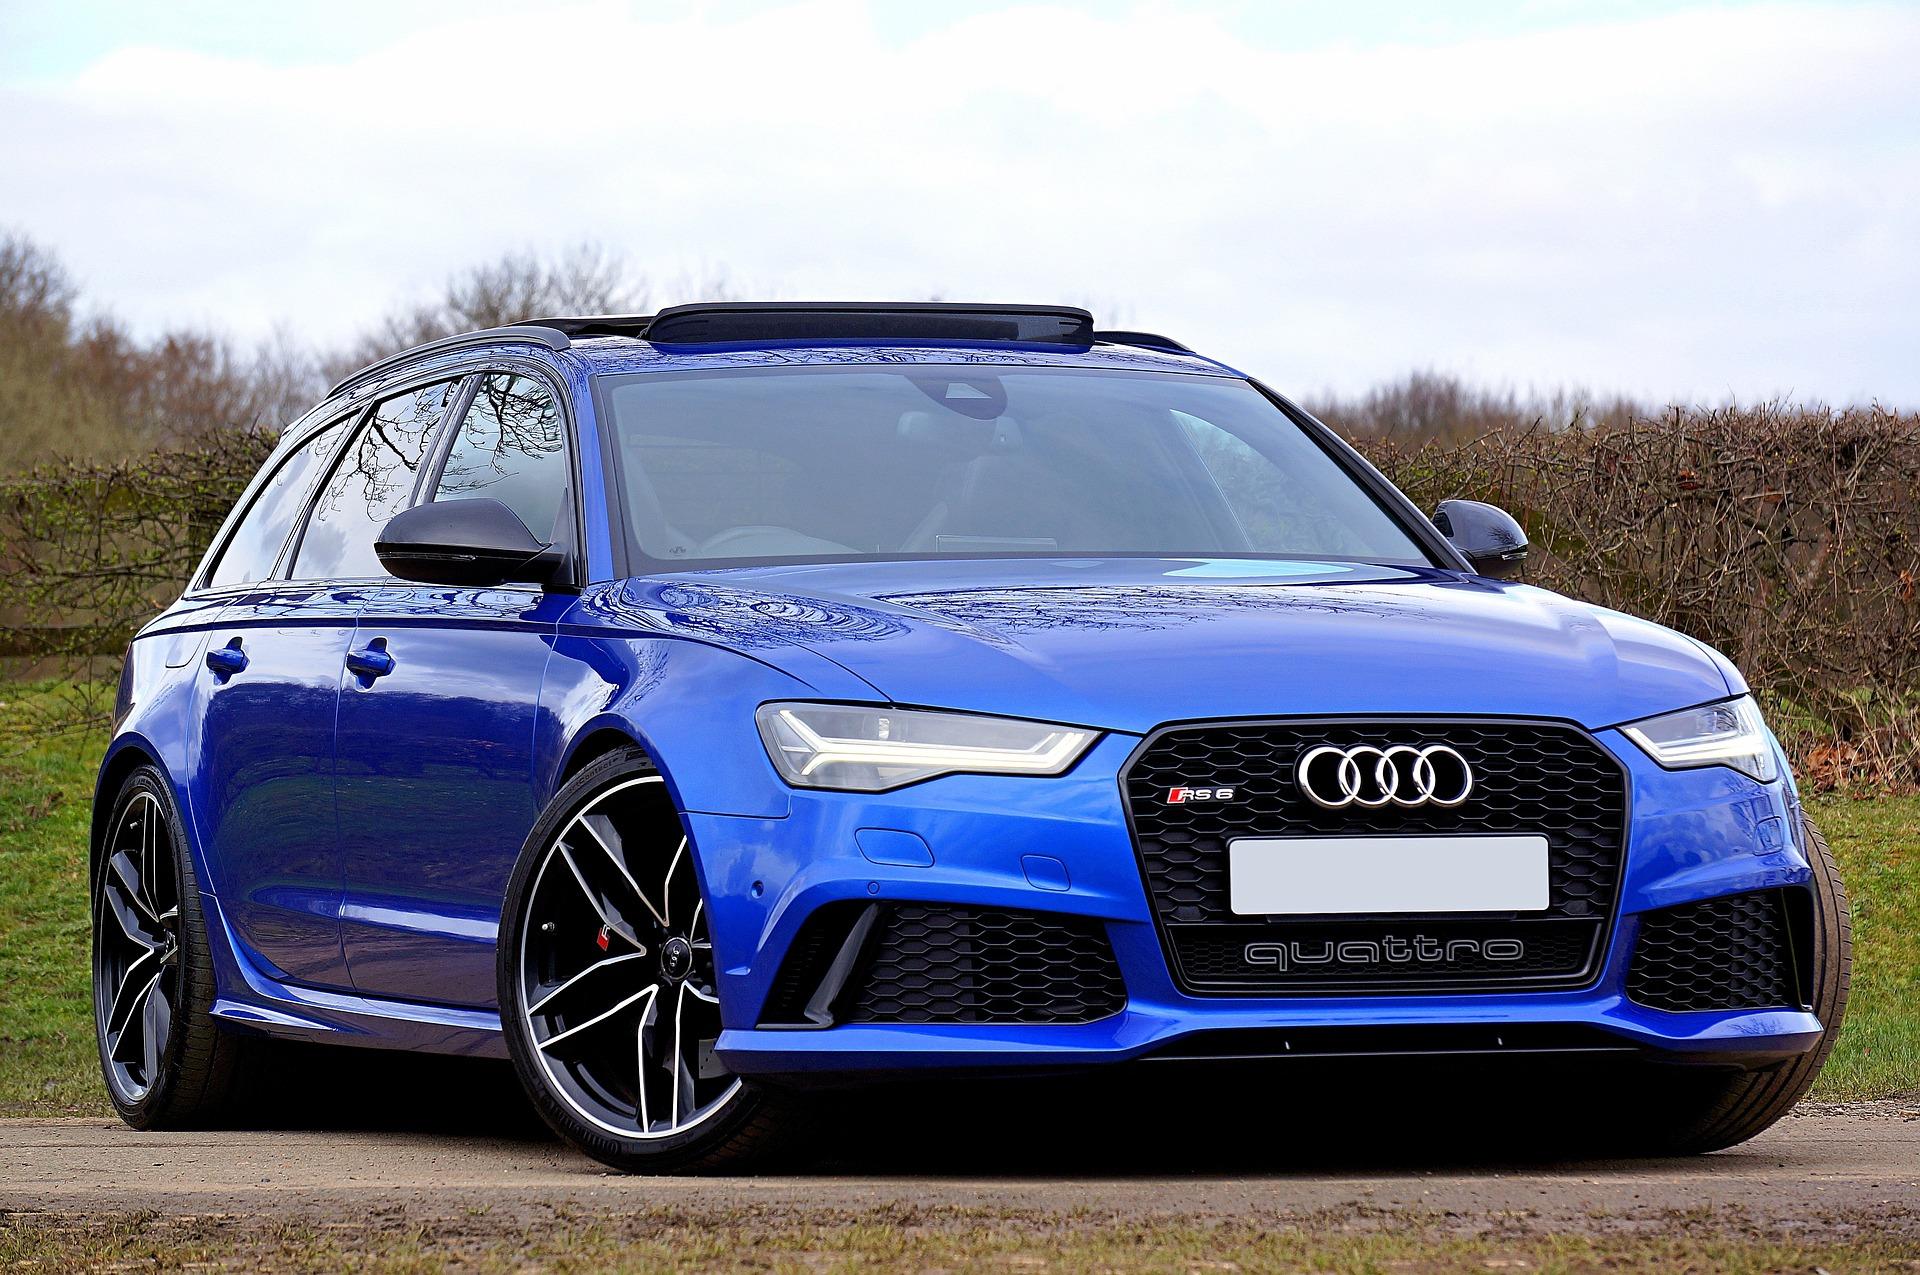 Specialiste reparation Audi